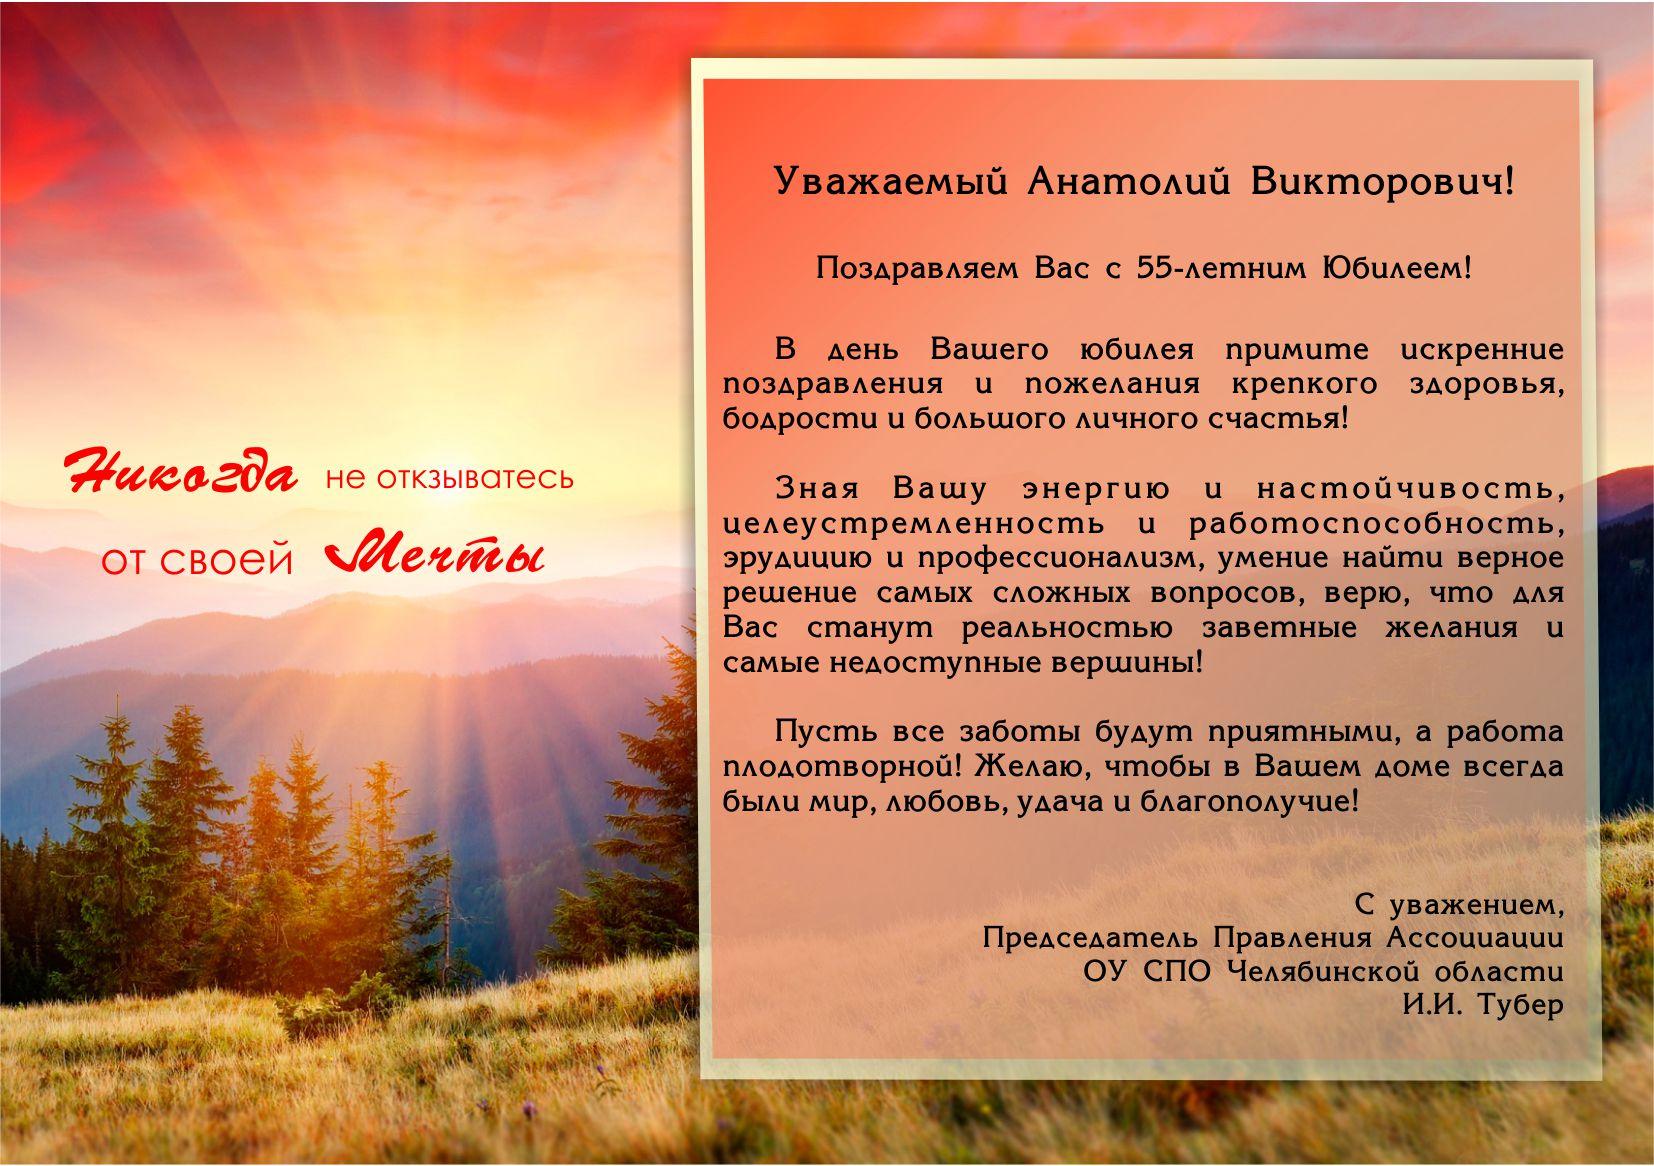 Анатолию Викторовичу